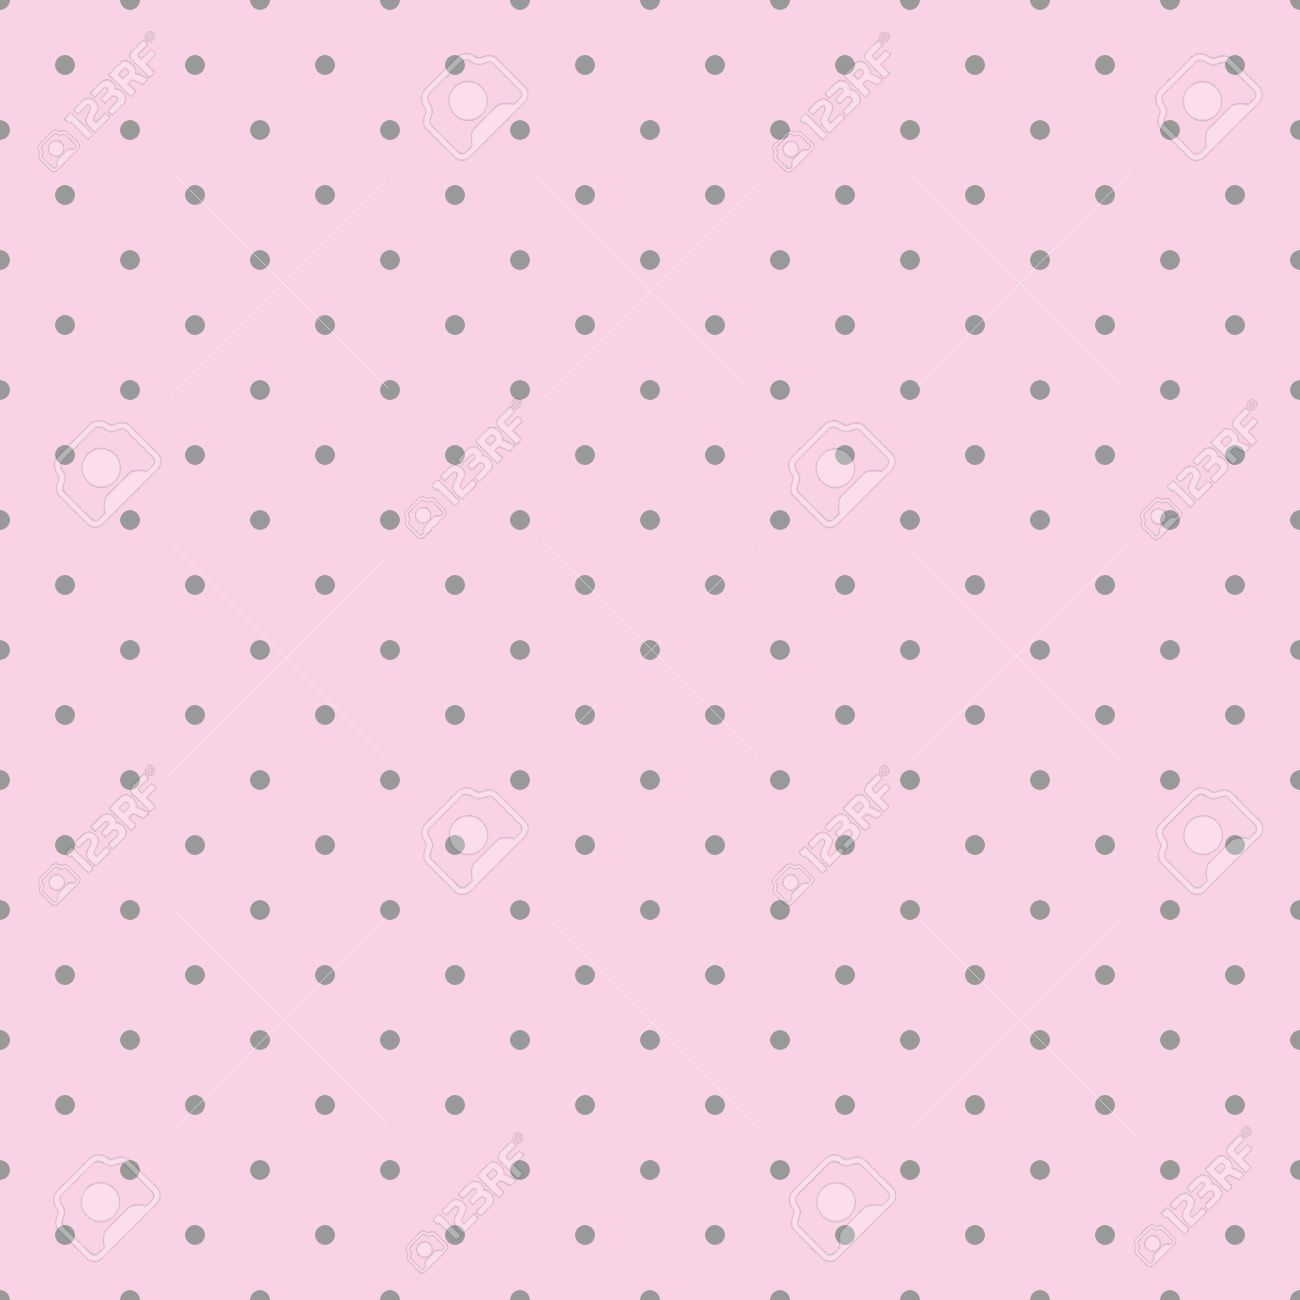 Modelo Inconsútil Del Vector De Color Rosa Con Lunares De Color Gris ...